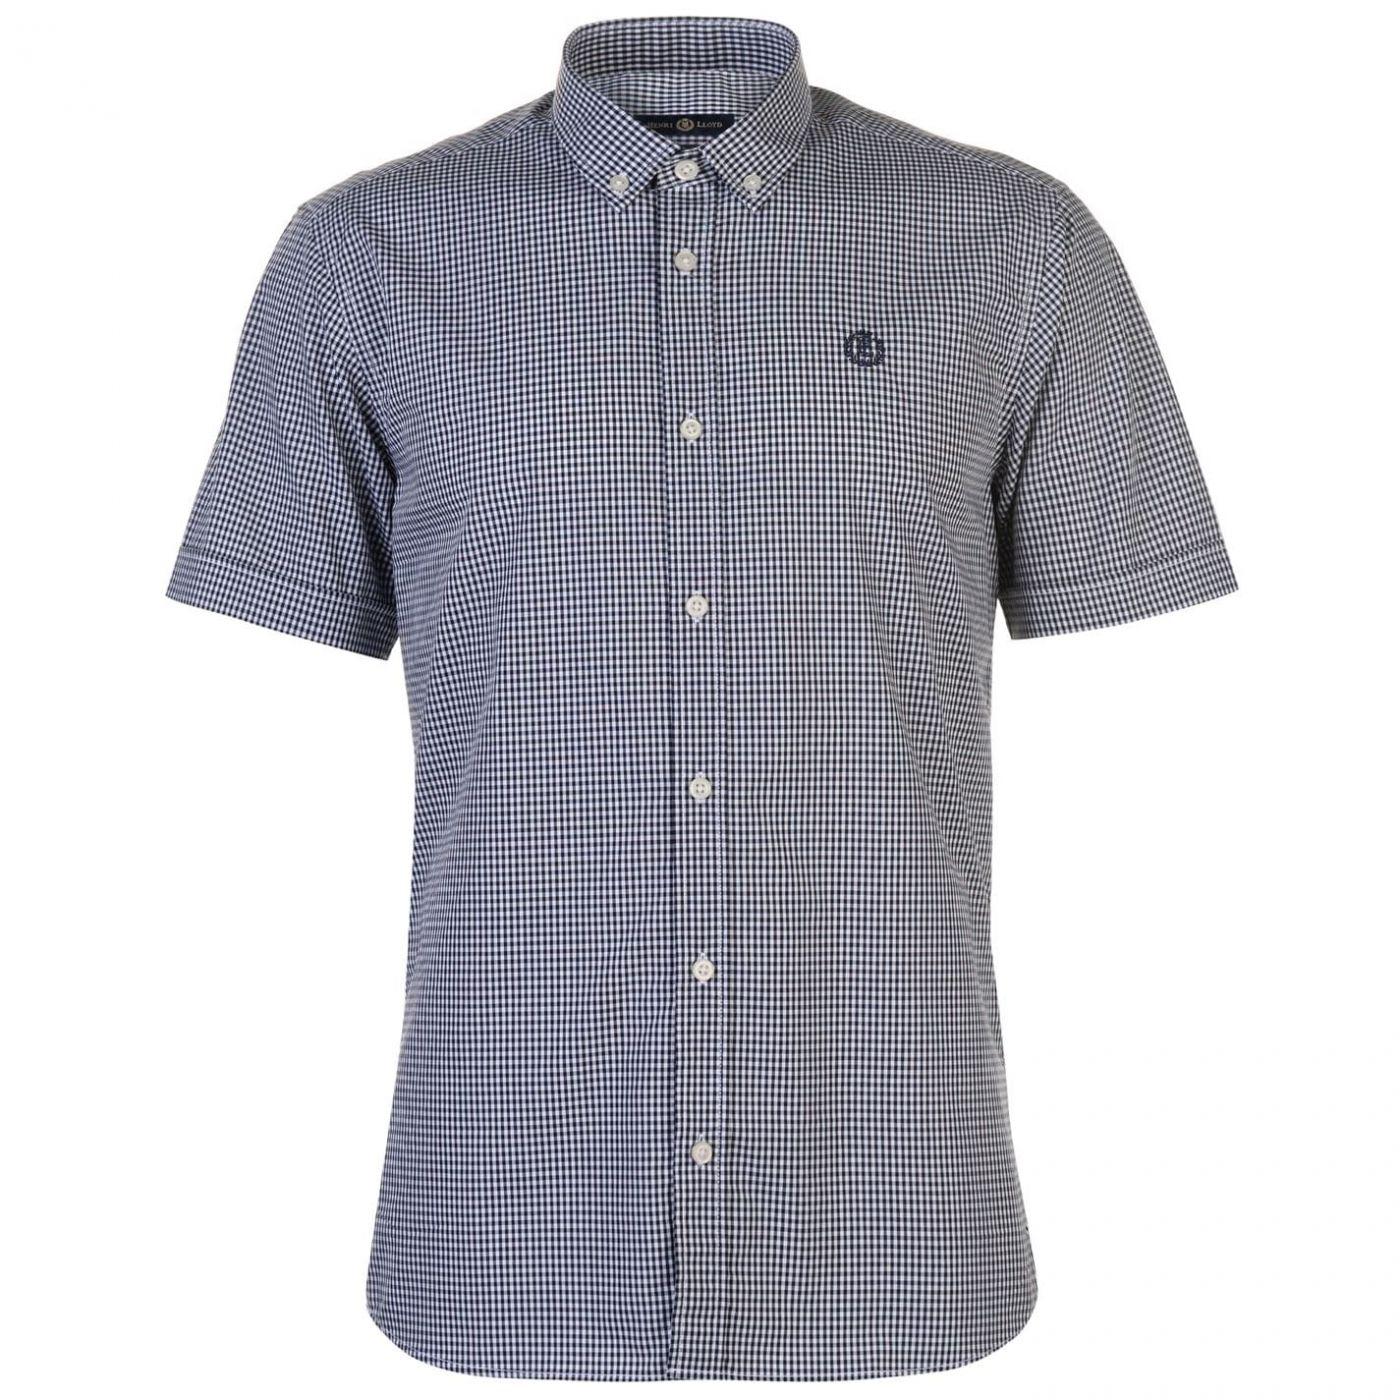 Henri Lloyd Gingham Shirt